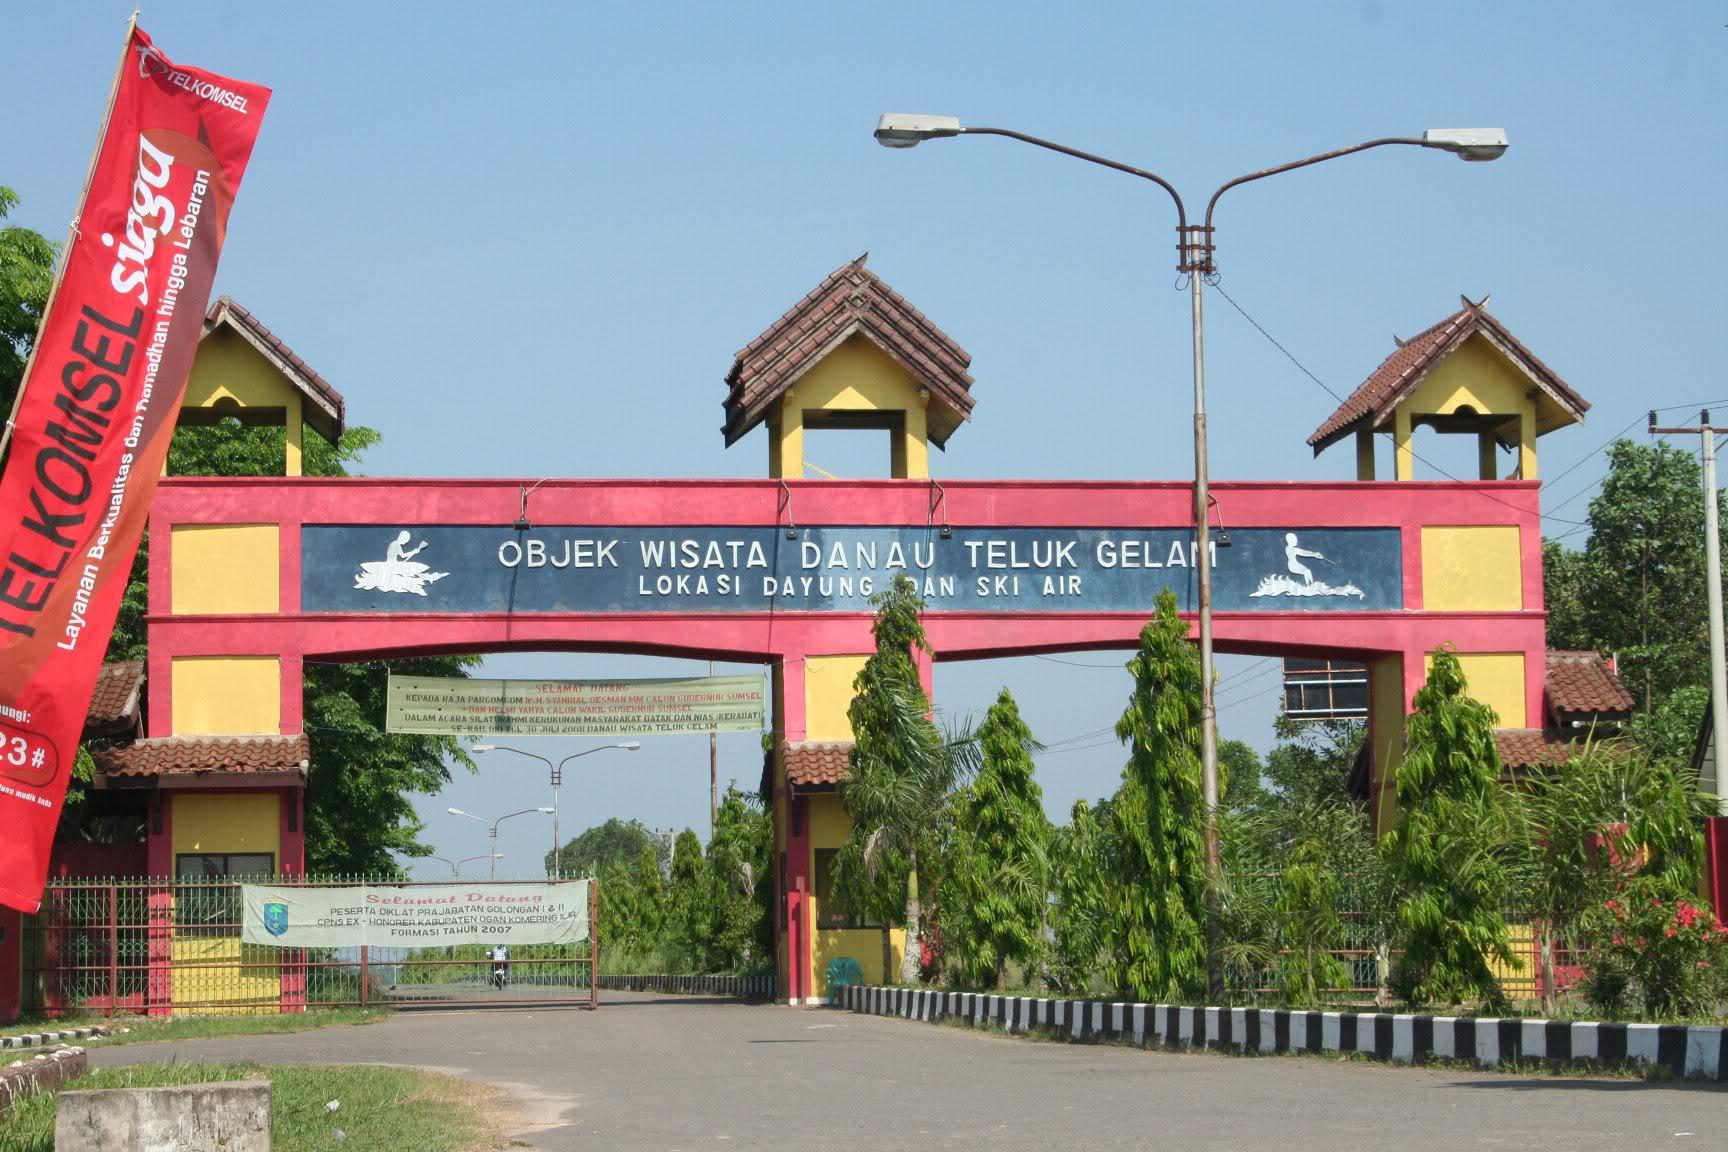 Dudi Gurnadi Catatan Perjalanan Lintas Timur Sumatera Daerah Wisata Teluk